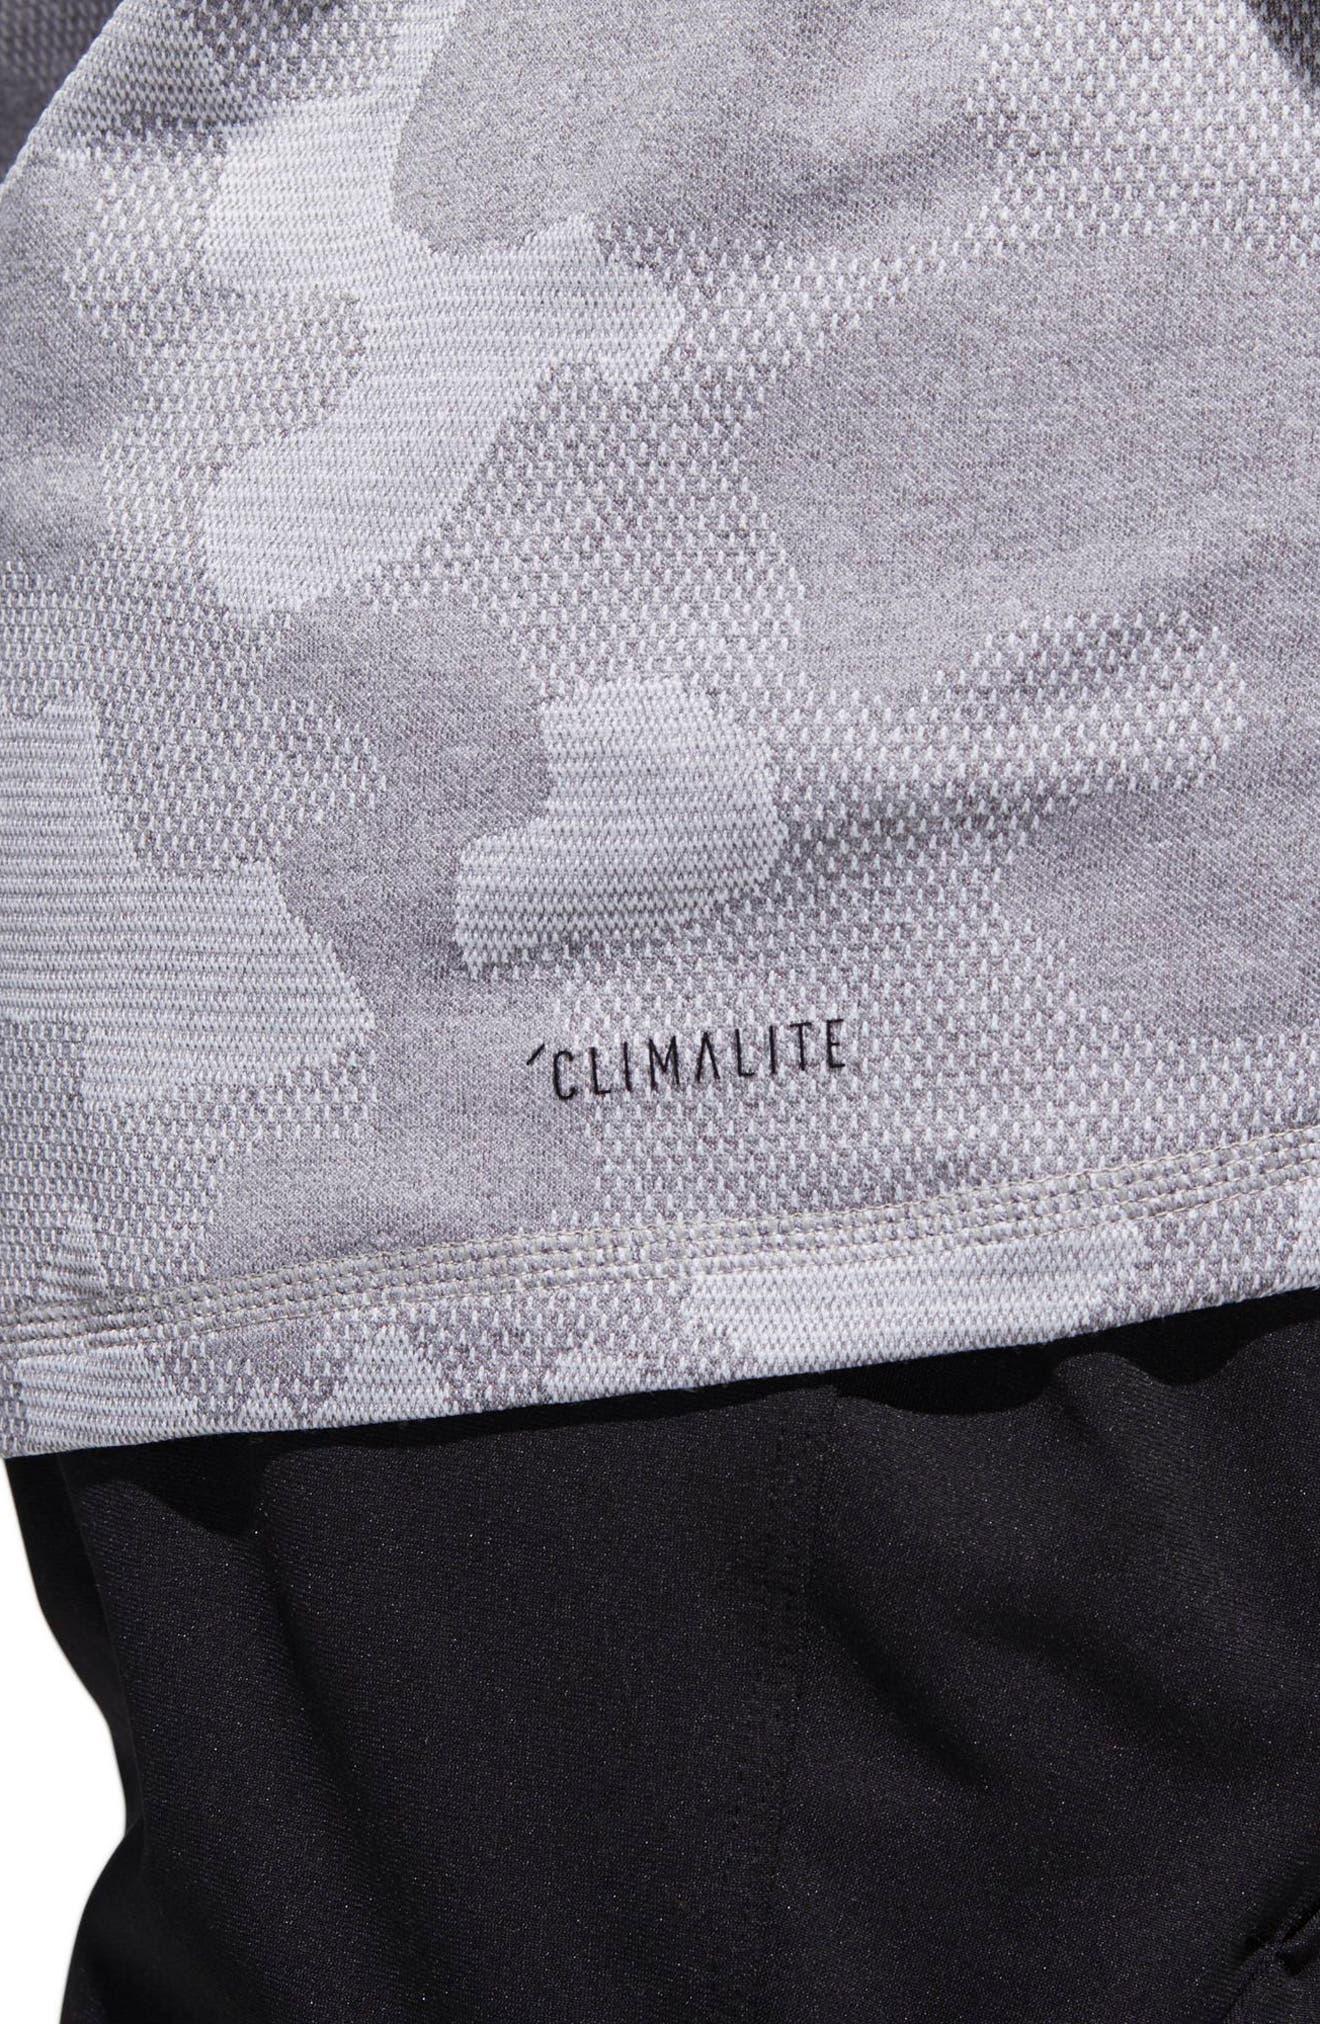 Camo Hype T-Shirt,                             Alternate thumbnail 5, color,                             Grey Three / White